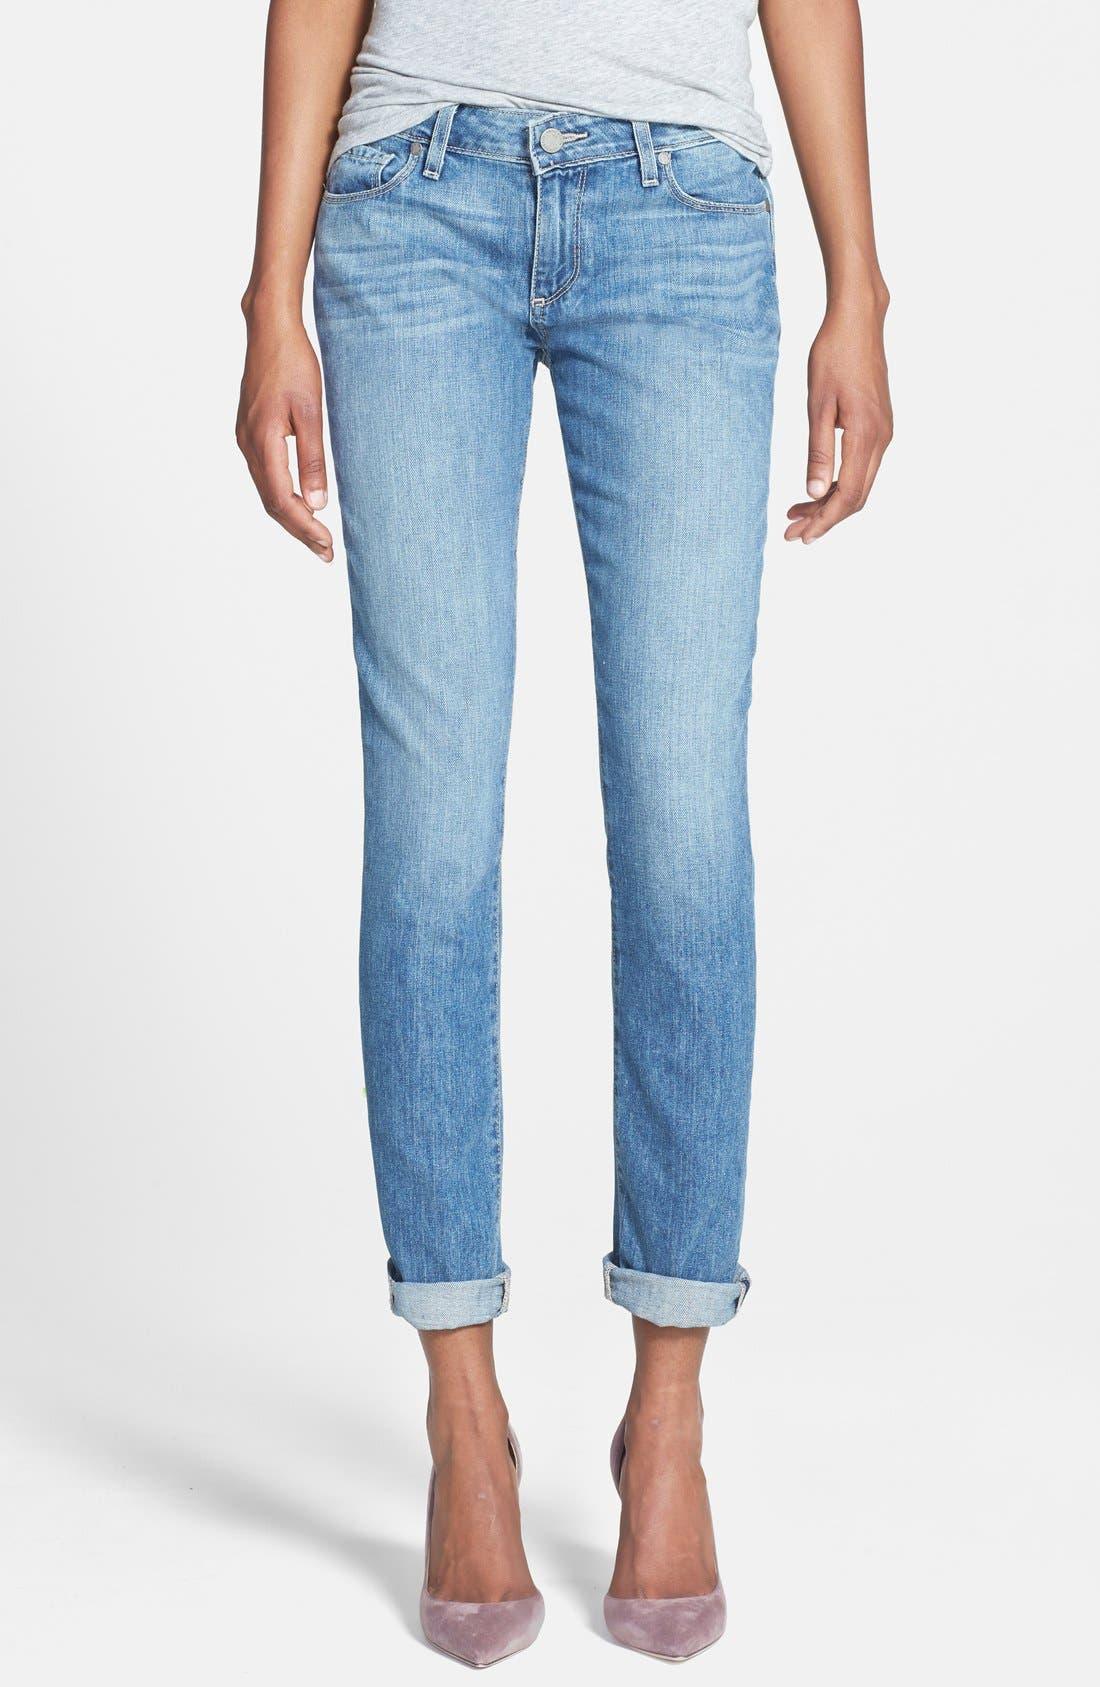 Denim 'Jimmy Jimmy' Boyfriend Skinny Jeans,                             Main thumbnail 1, color,                             450